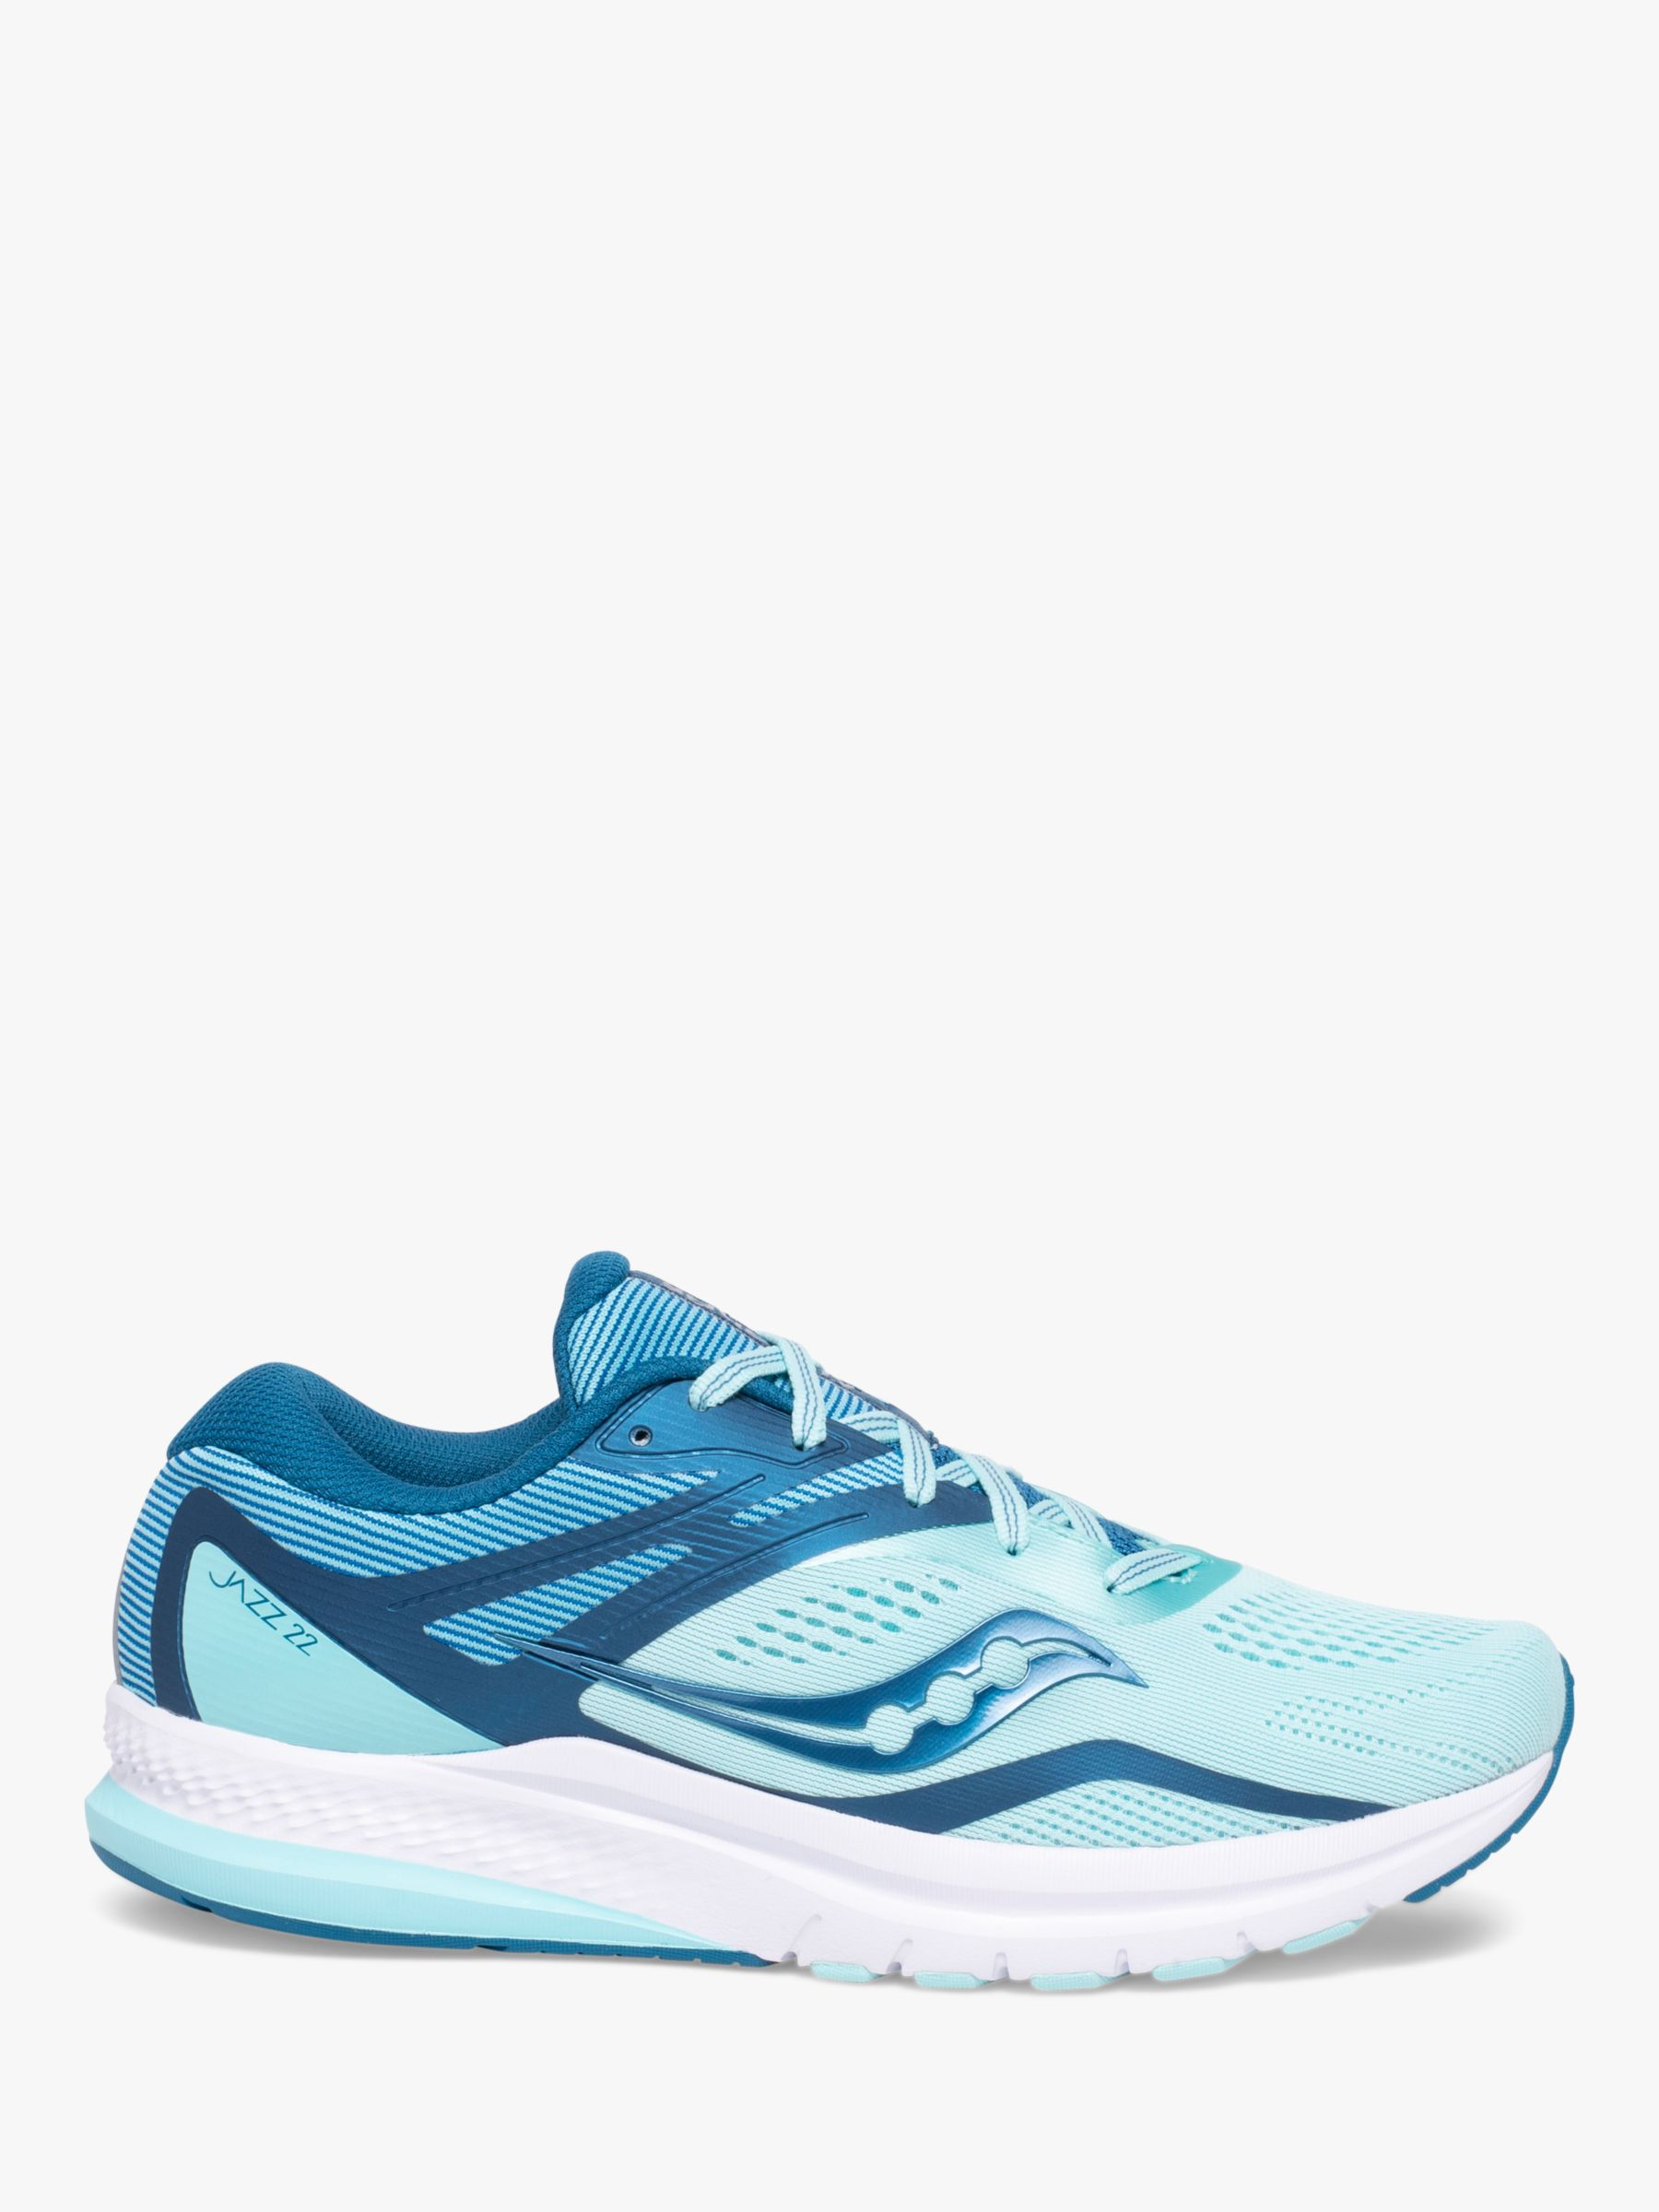 Saucony Saucony Jazz 22 Women's Running Shoes, Blue/Aqua